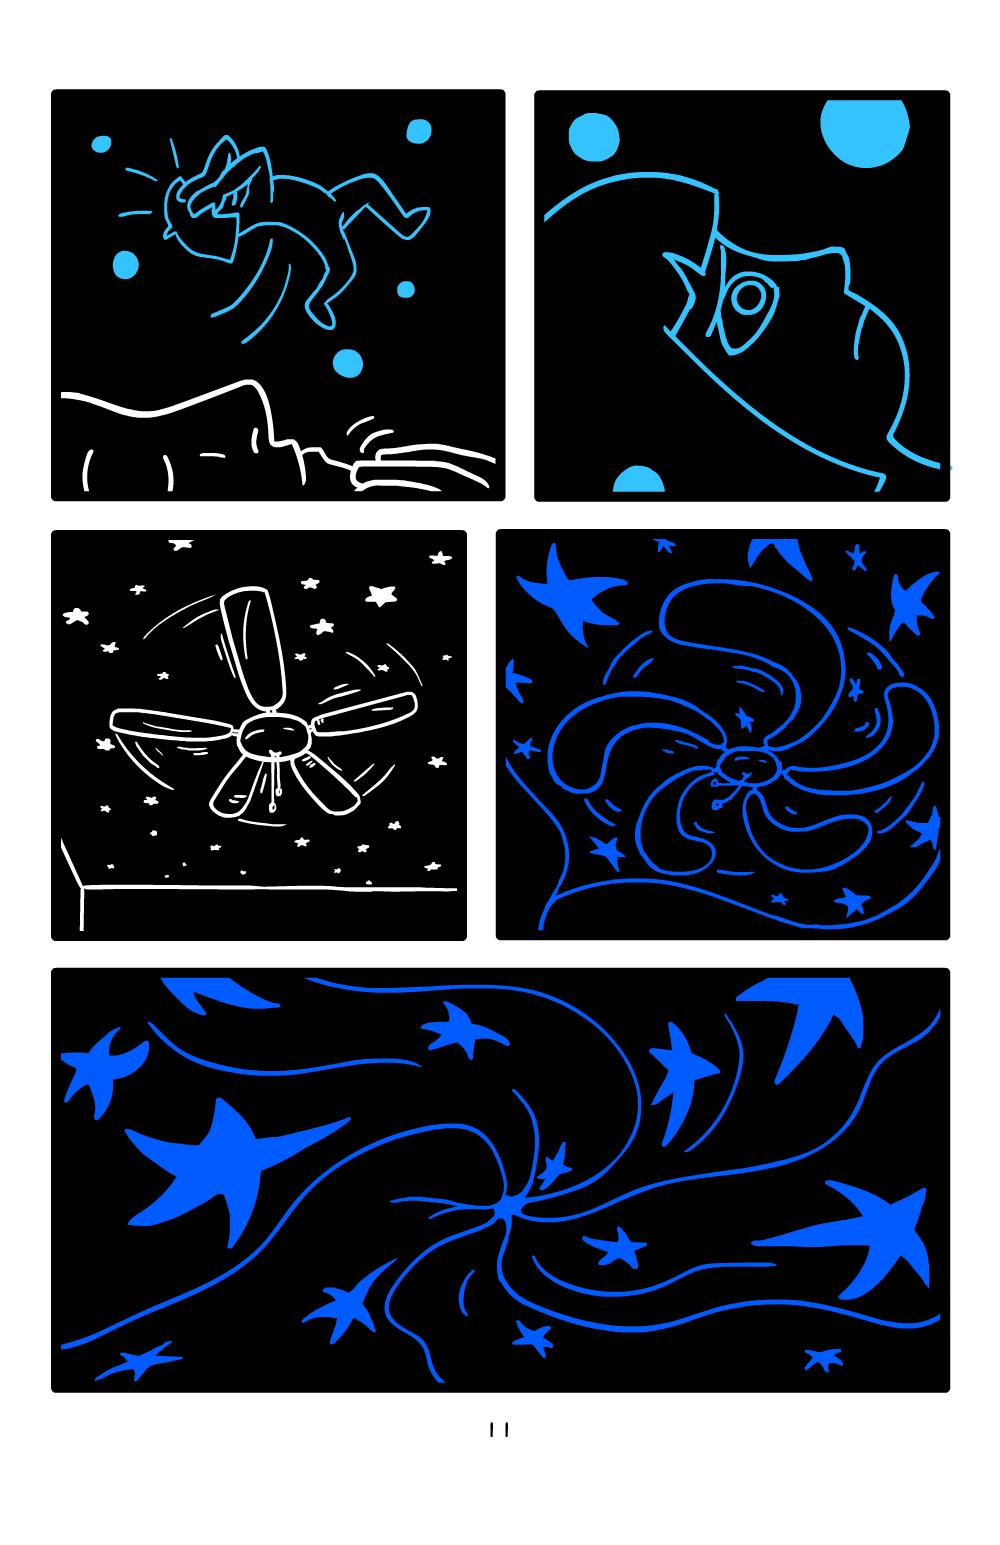 The-Body-Sleeps-9-15-11.jpg